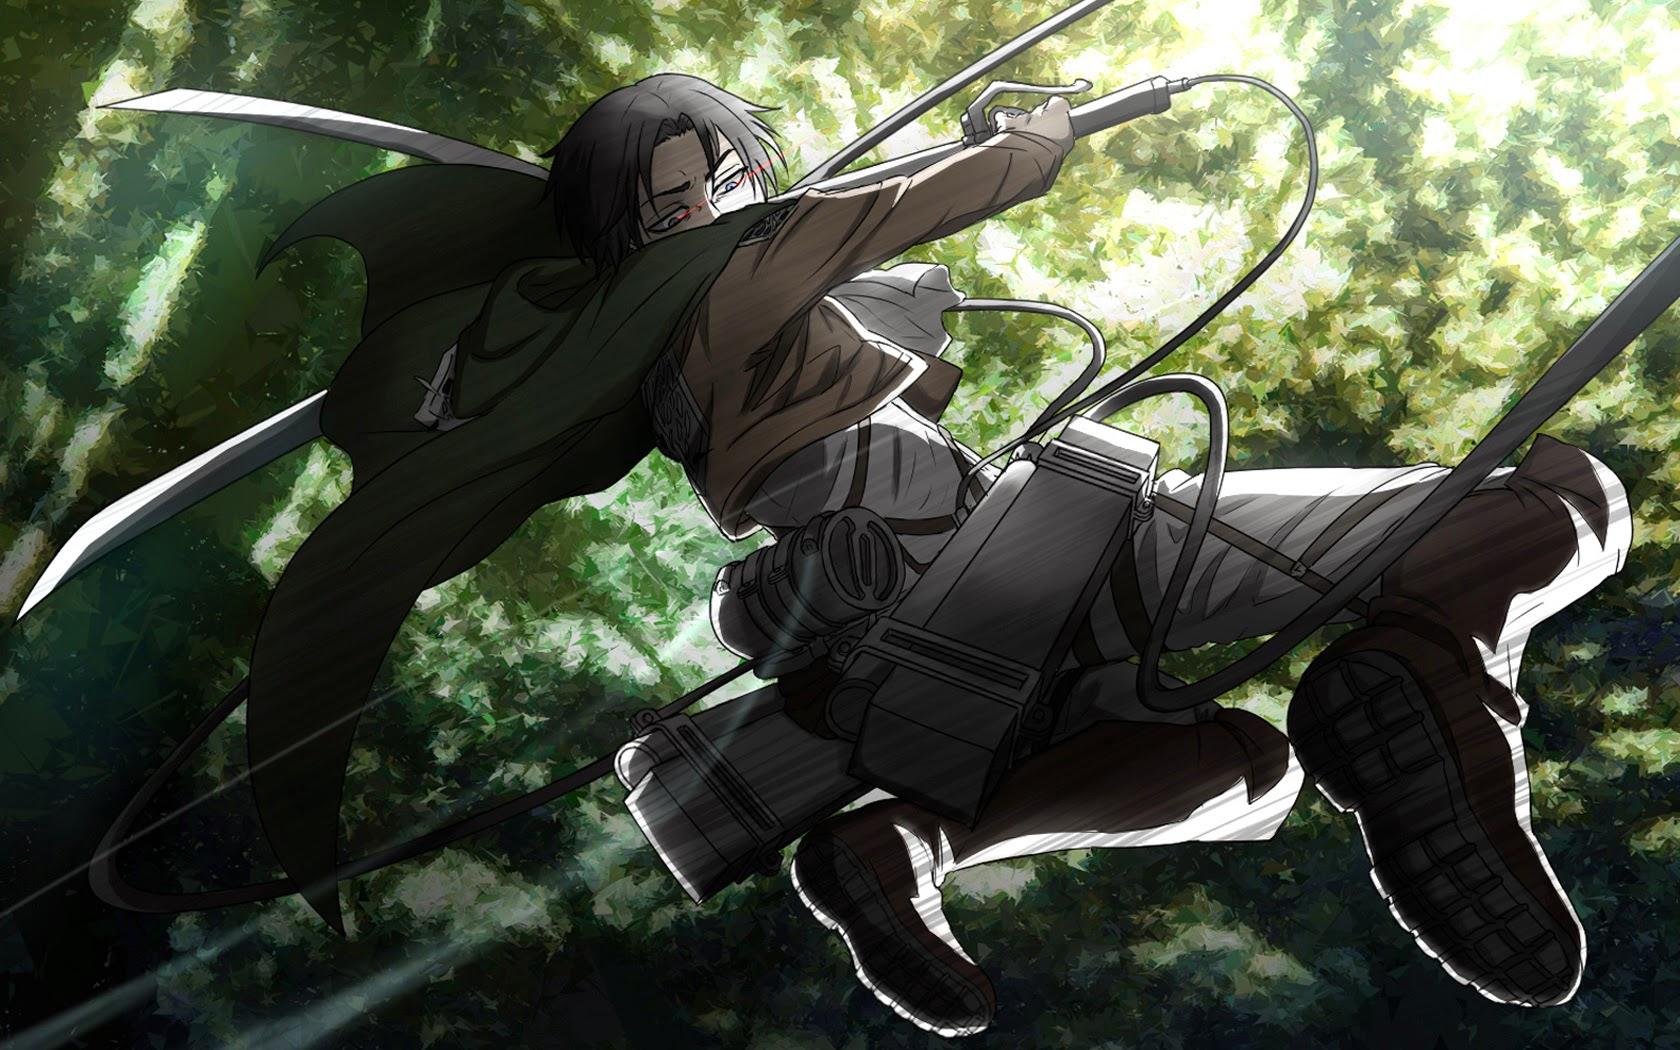 Free Download Captain Levi Attack On Titan Shingeki No Kyojin Anime Hd Wallpaper 1680x1050 For Your Desktop Mobile Tablet Explore 49 Hd Attack On Titan Wallpapers Attack On Titan